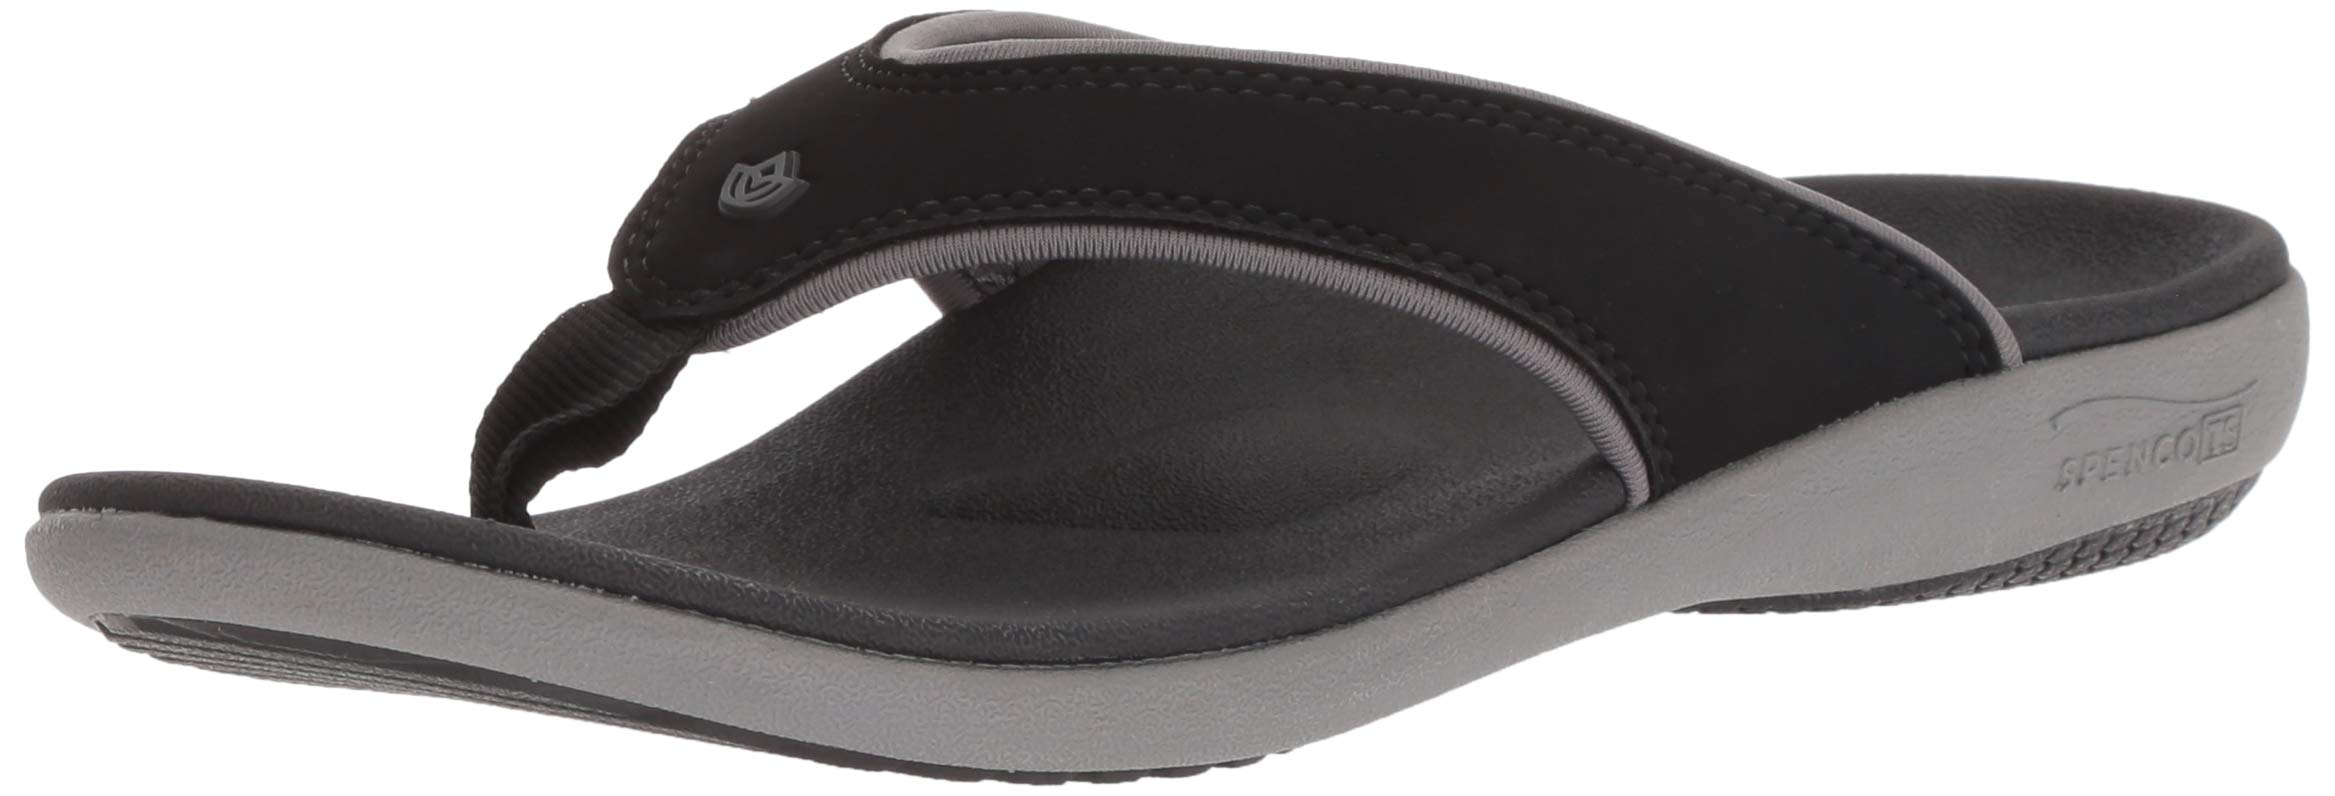 Spenco Women's Yumi Plus Sandal, Onyx 6 Wide US by Spenco (Image #1)